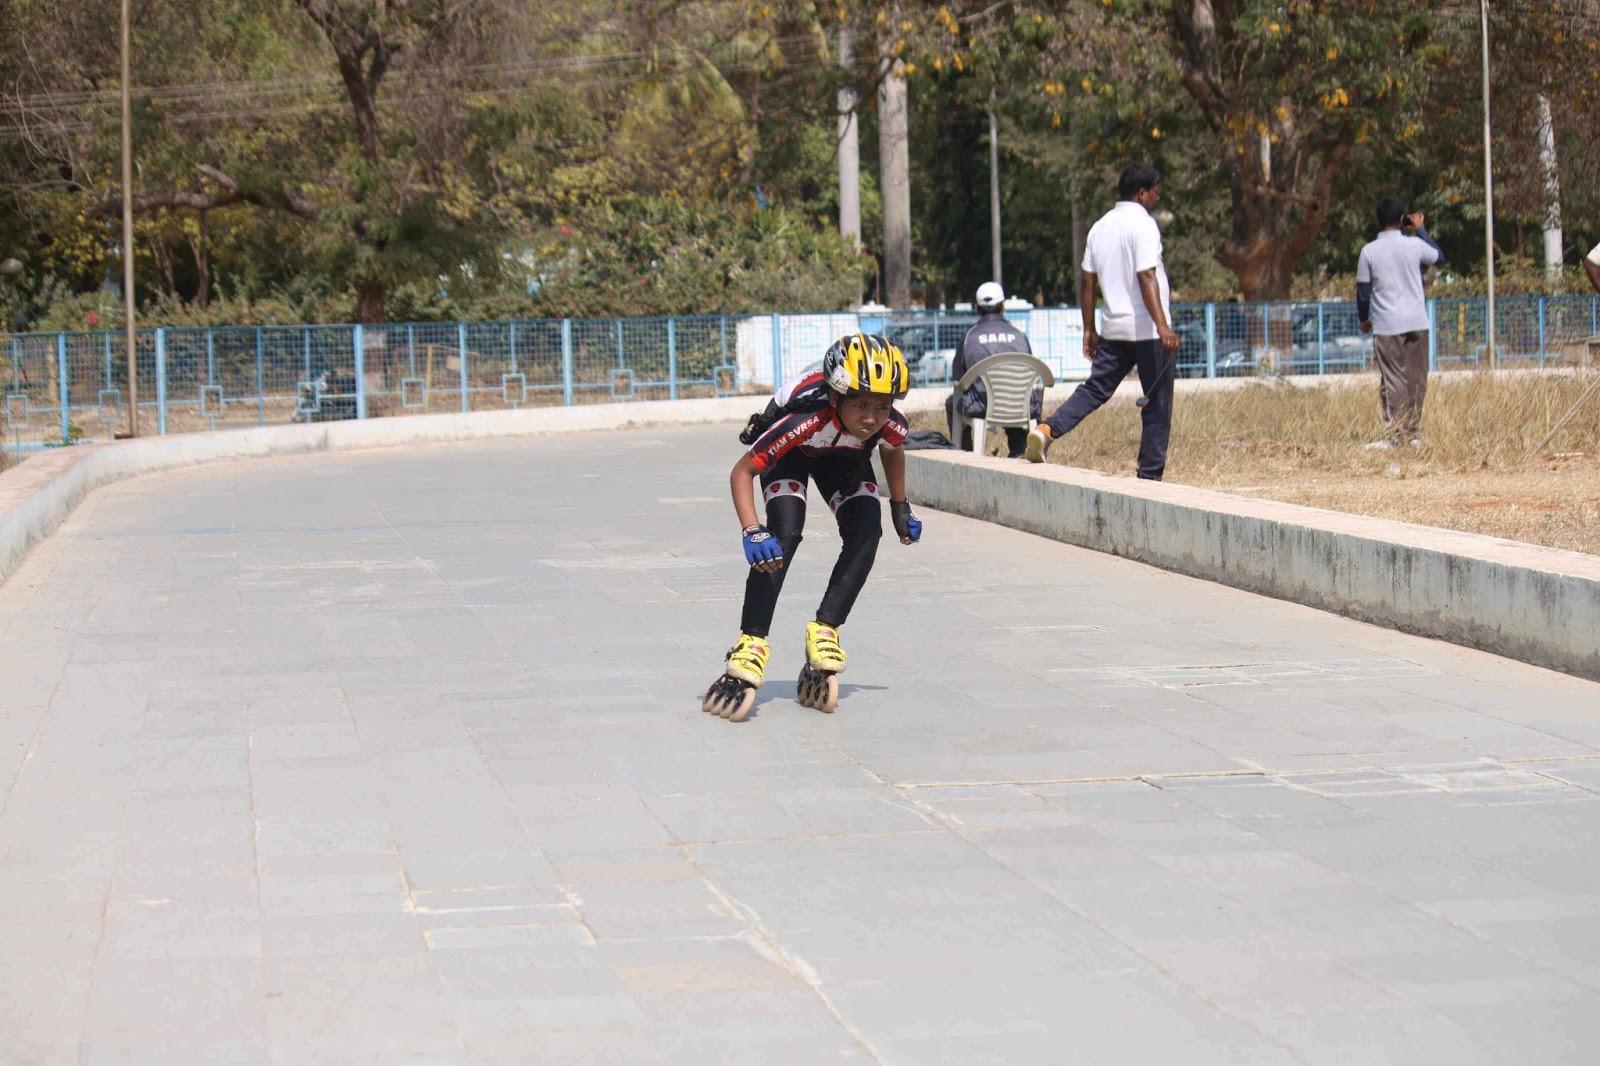 skating classes at chirec school in hyderabad vans skate skate tennis shoe